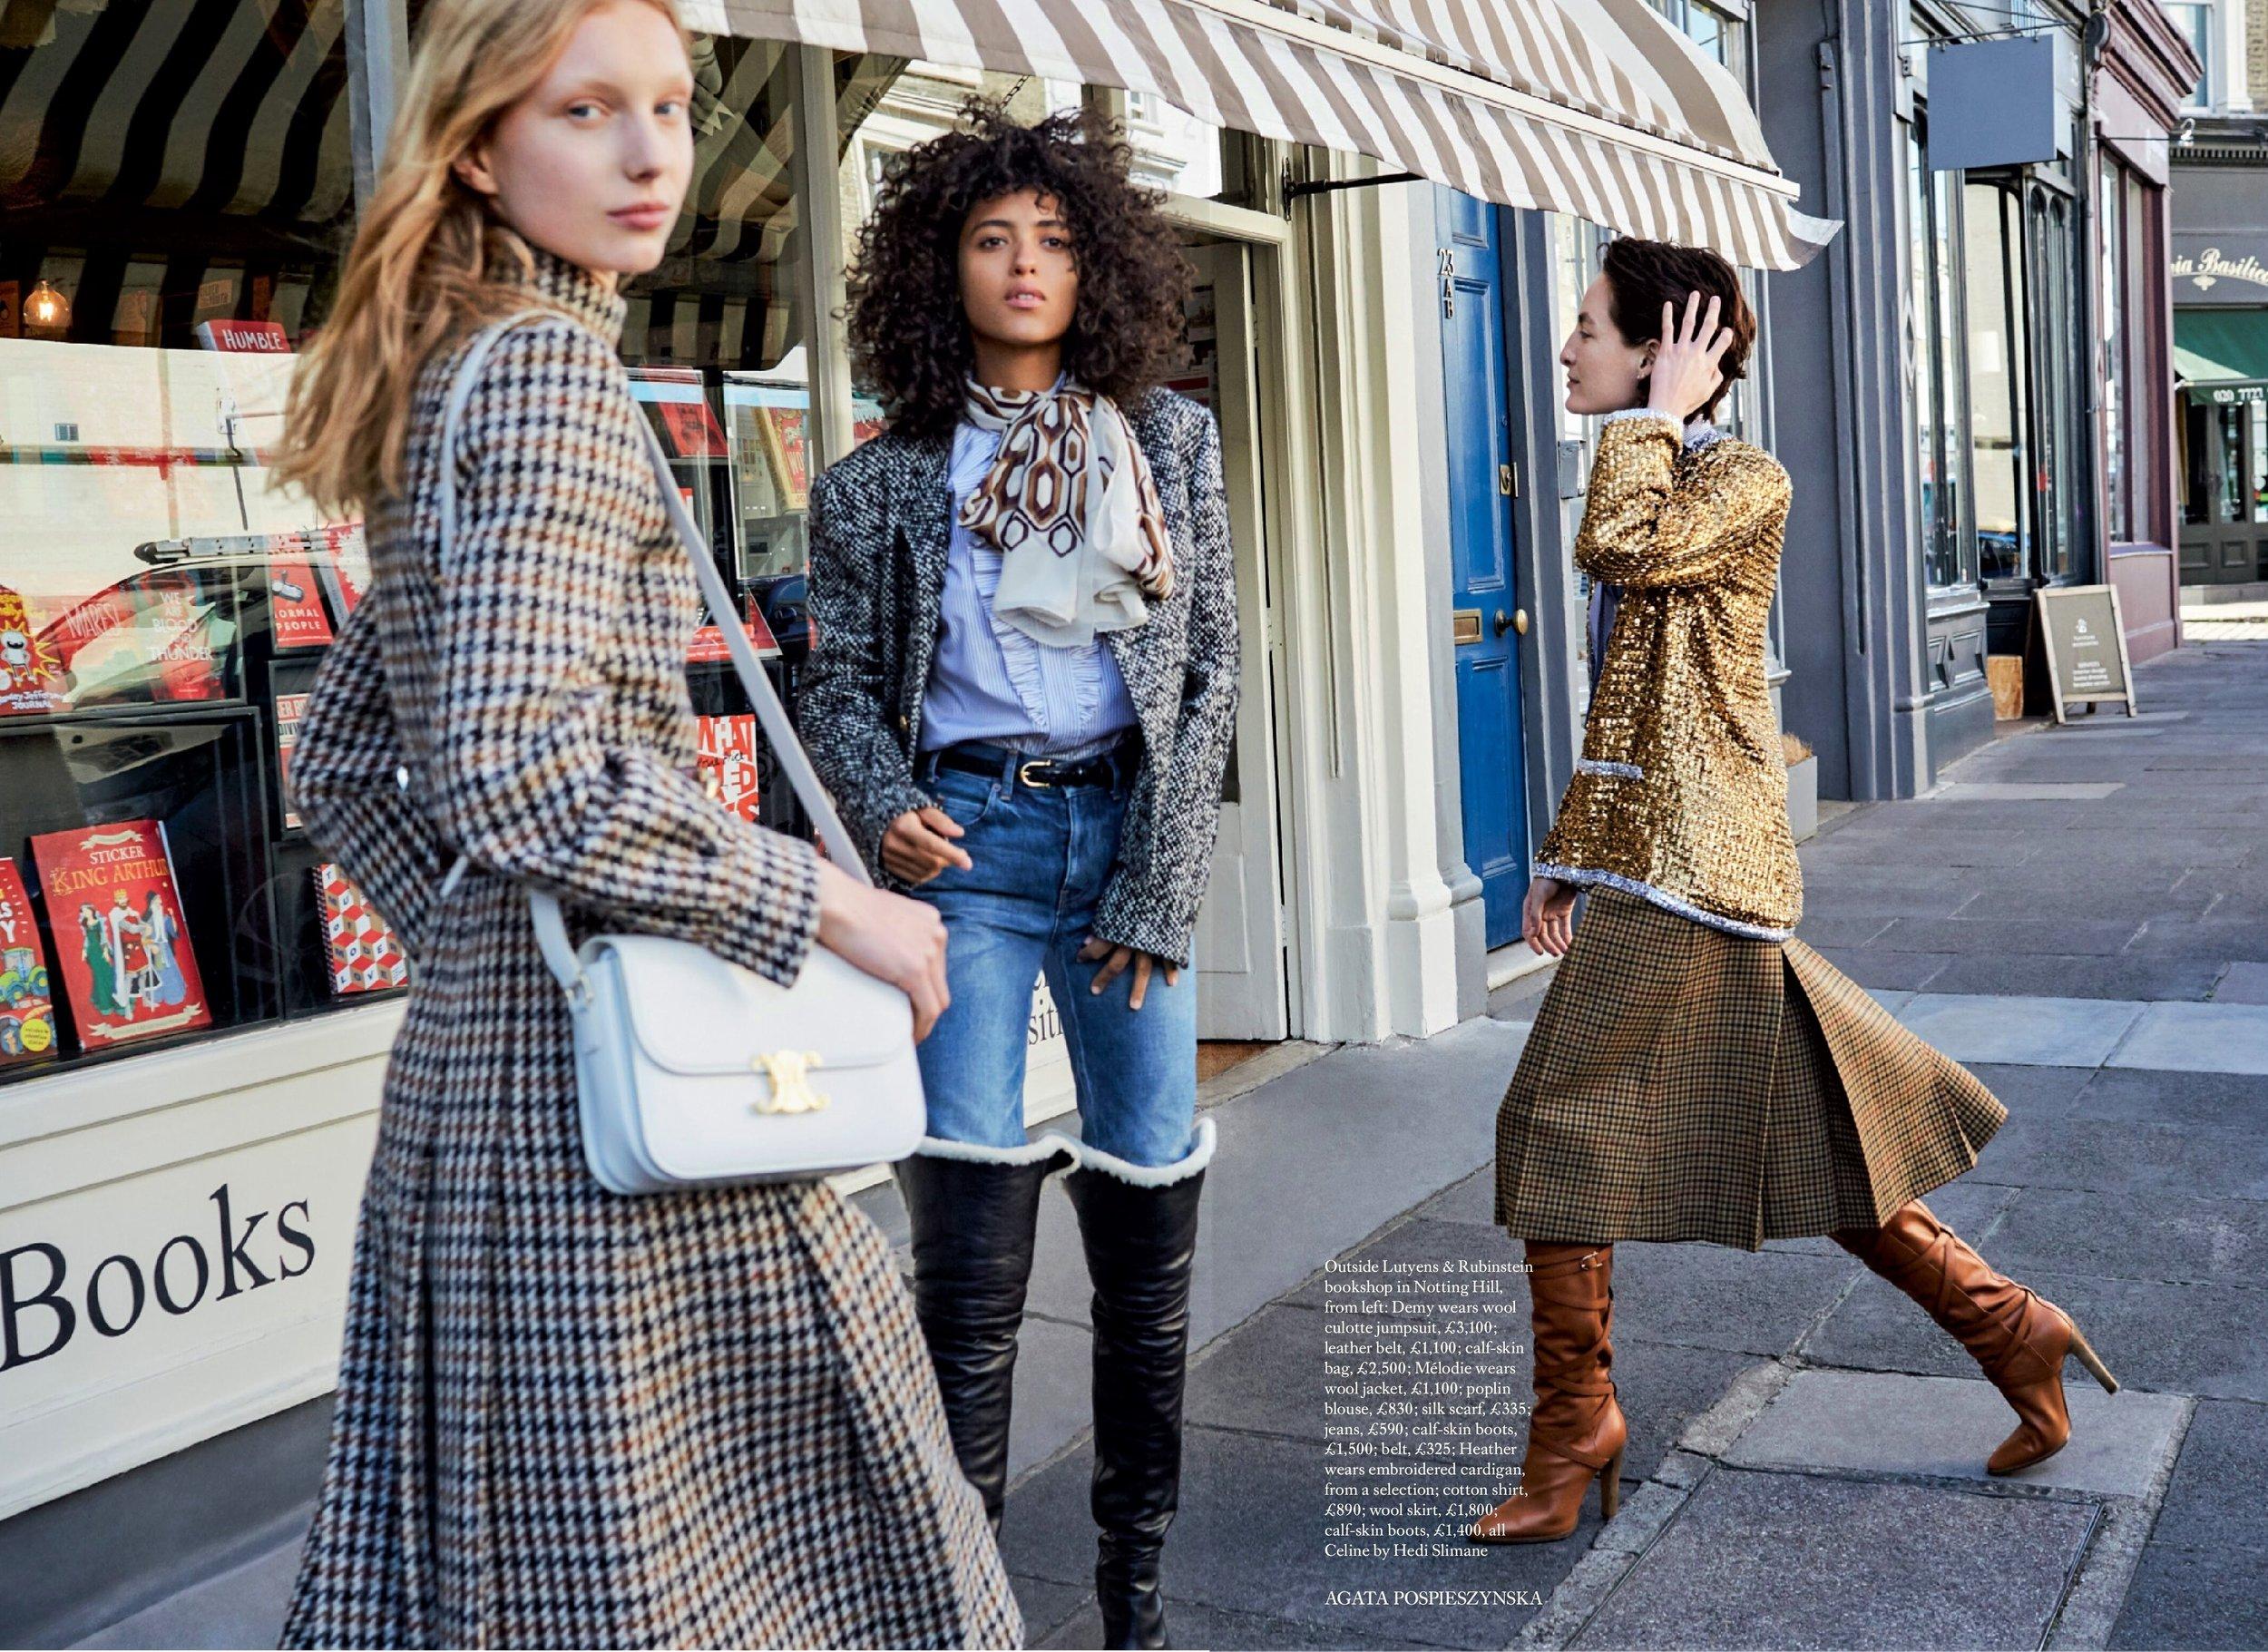 Agata Popieszynska-Girls Are Back in Town Harper's Bazaar UK Aug 2019 (22).jpg